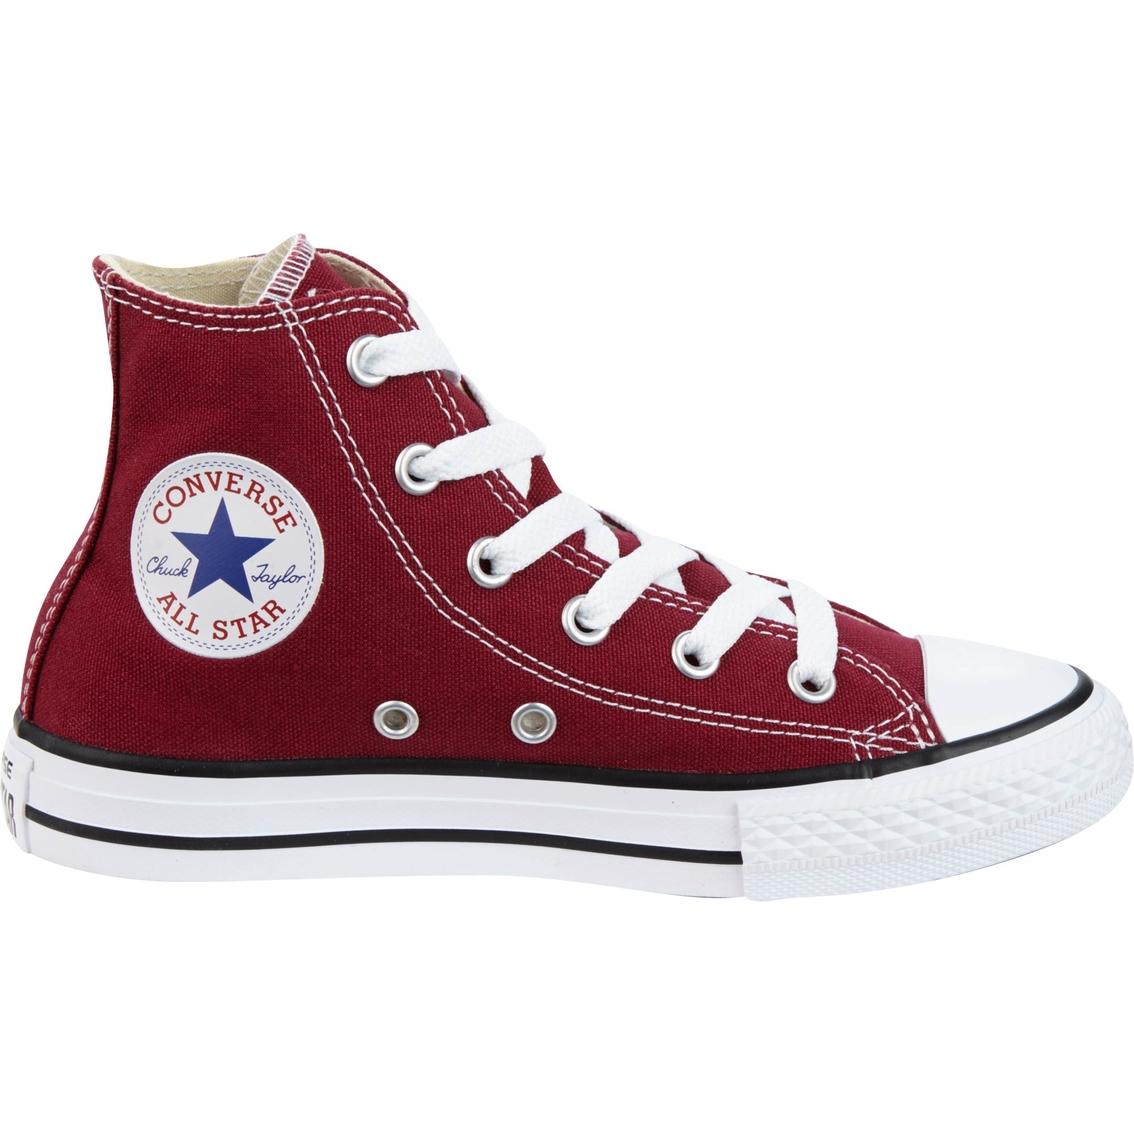 Converse preschool boys chuck taylor all star high top sneakers jpg  1134x1134 Boys high top converse 10382abac